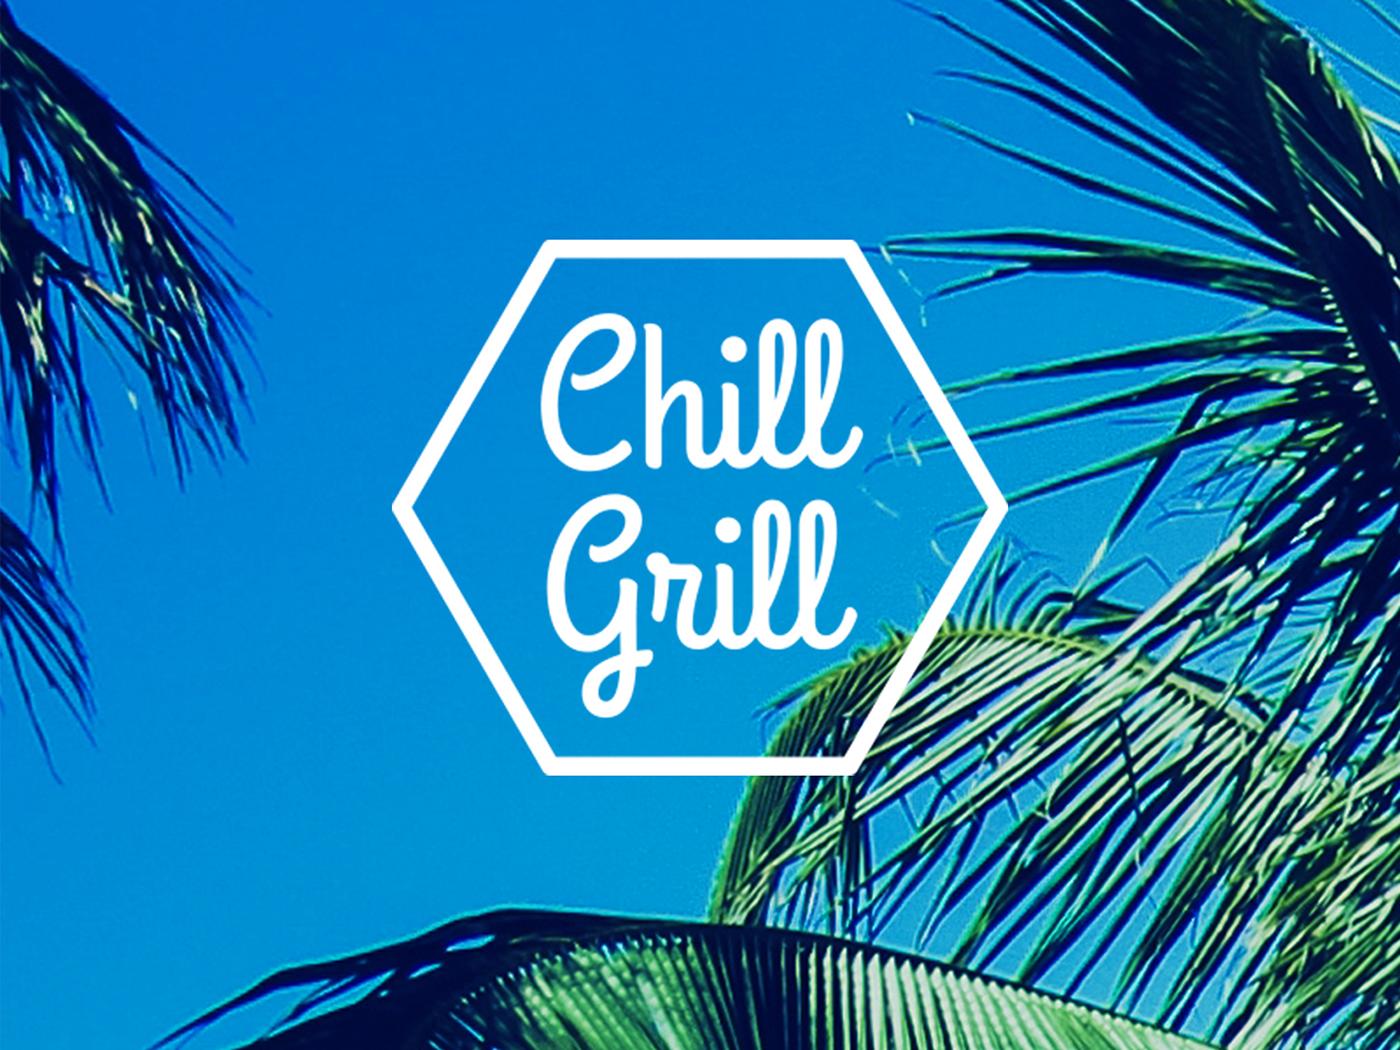 chill grill logo prints on behance. Black Bedroom Furniture Sets. Home Design Ideas